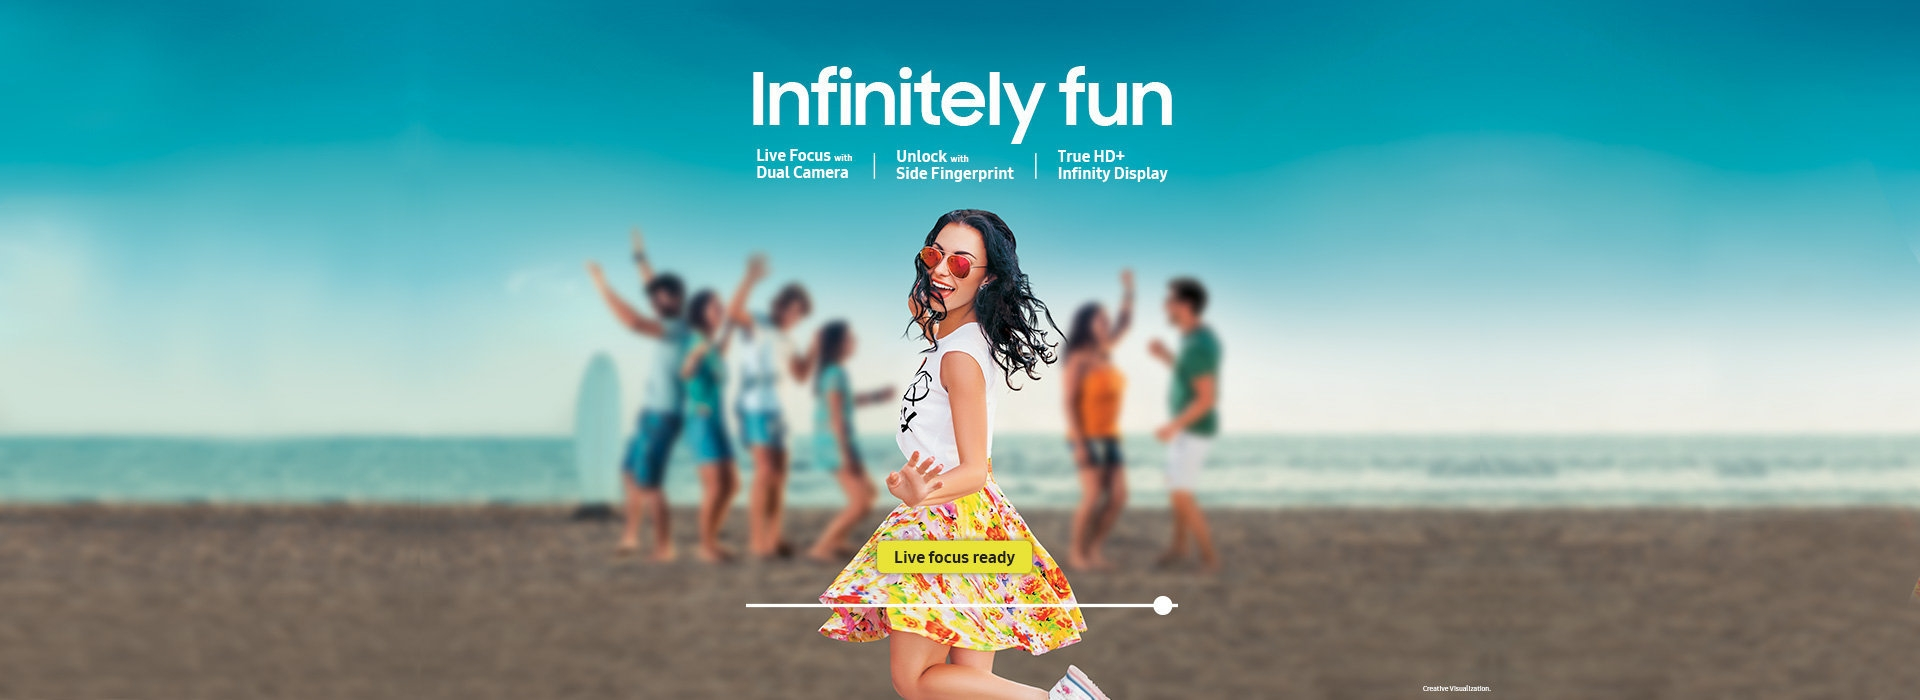 Infinitely Fun - Samsung Galaxy J6+